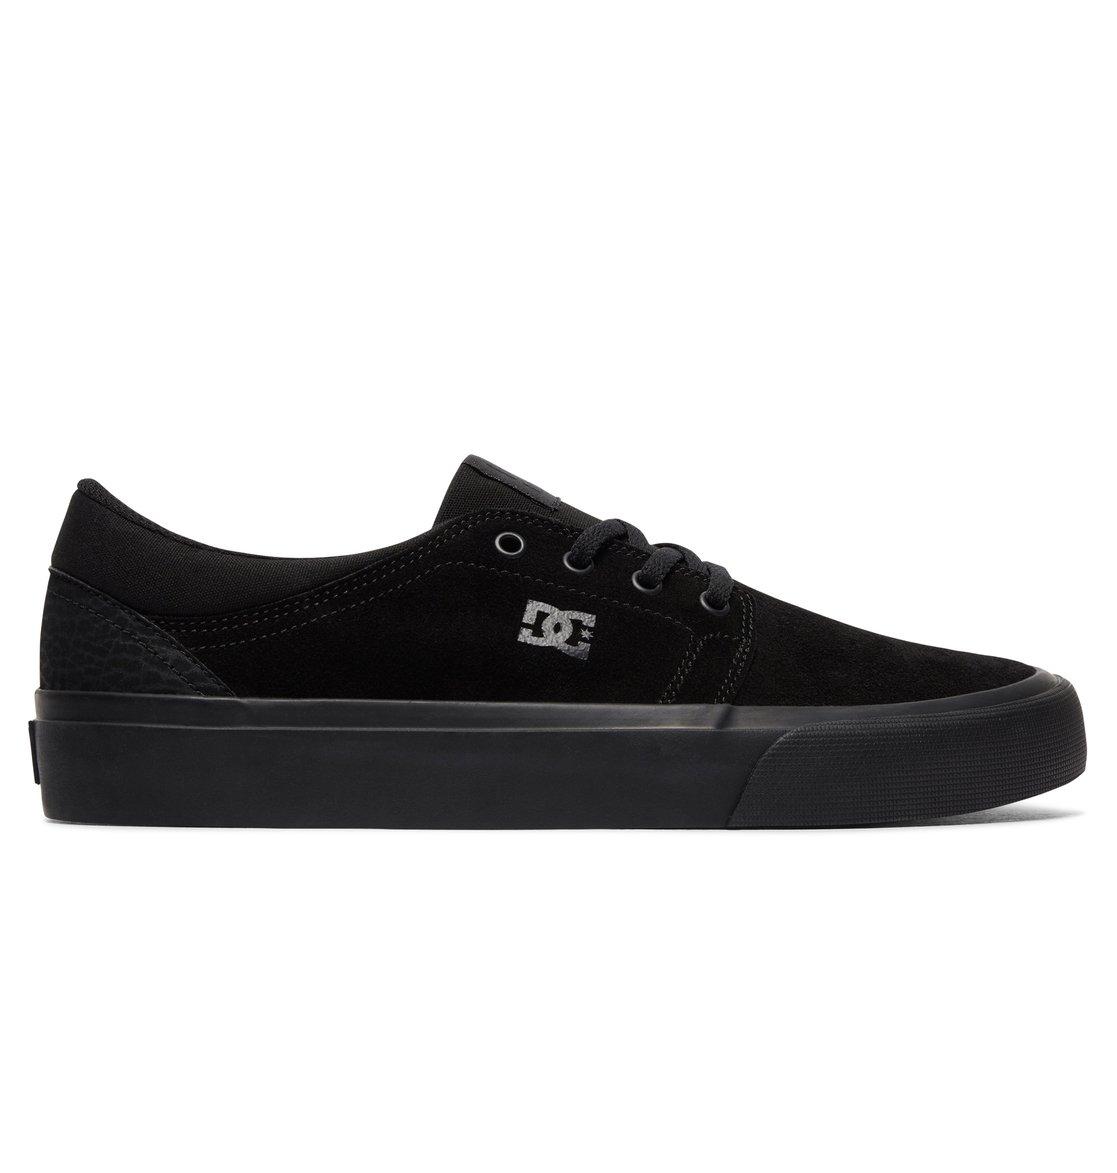 DC Trase S Chaussure - black black white PnJqnK448